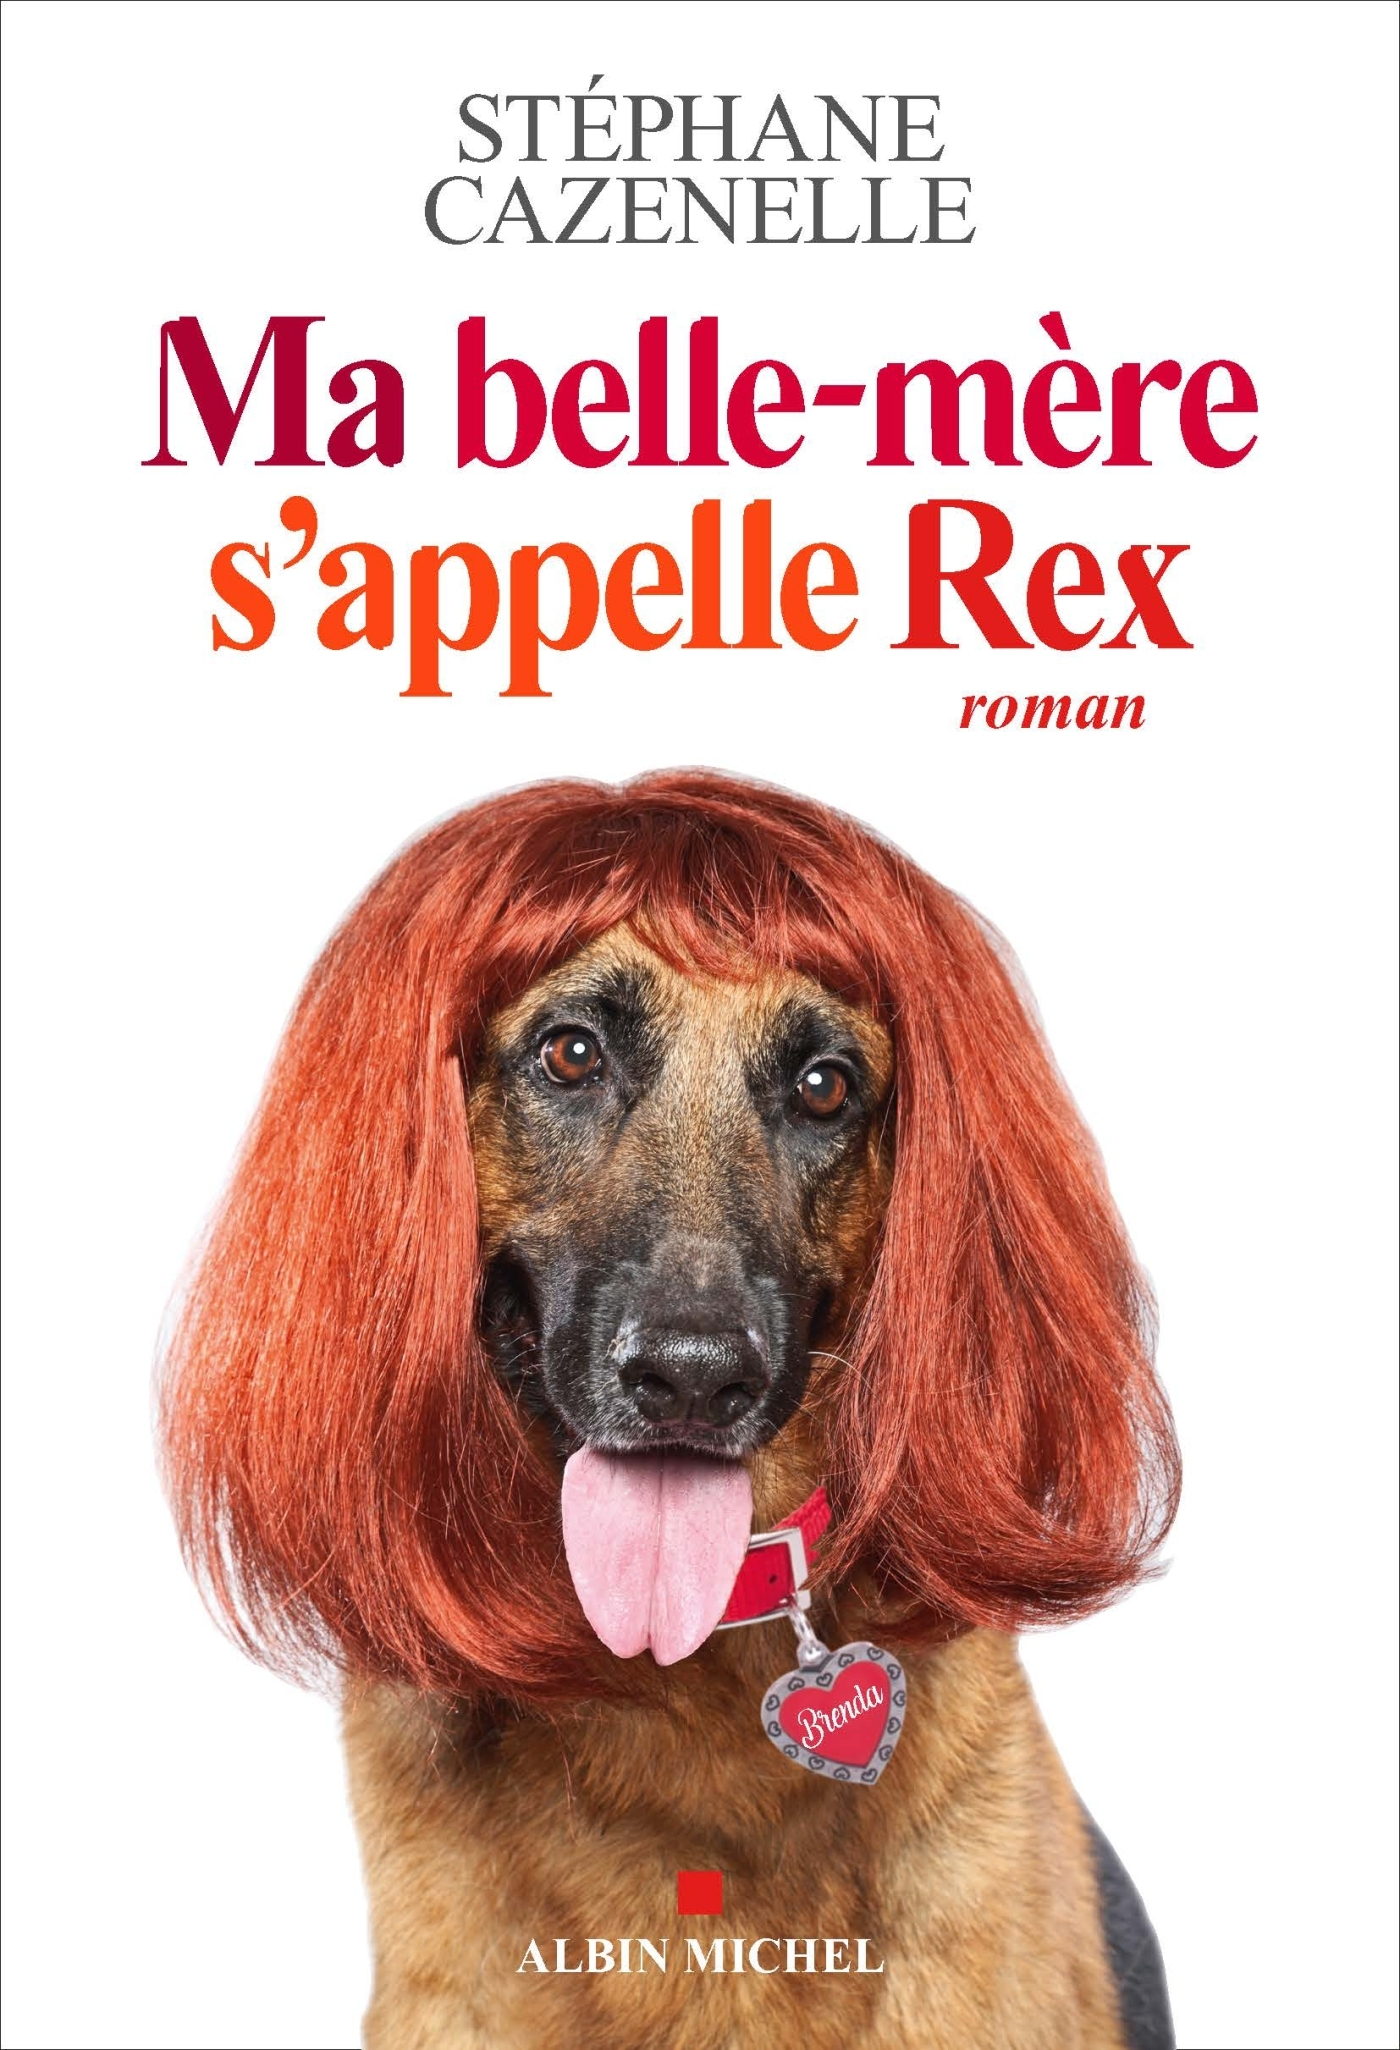 MA BELLE-MERE S'APPELLE REX